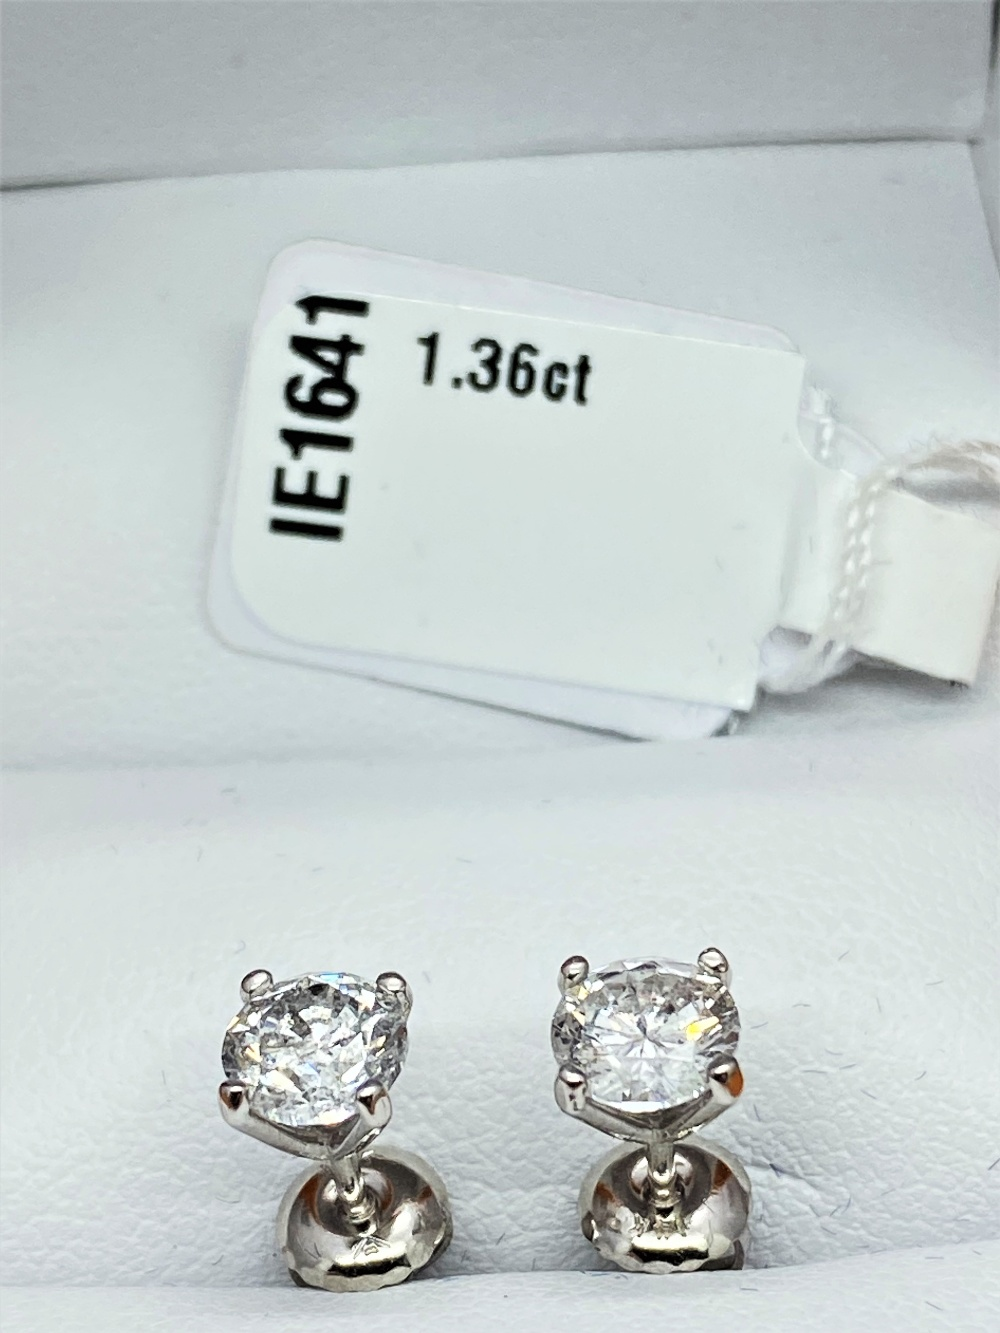 Pair of New 1.36 Carat Round Cut VS1/D Diamond Stud Earrings On 14K Hallmarked White Gold - Image 8 of 8